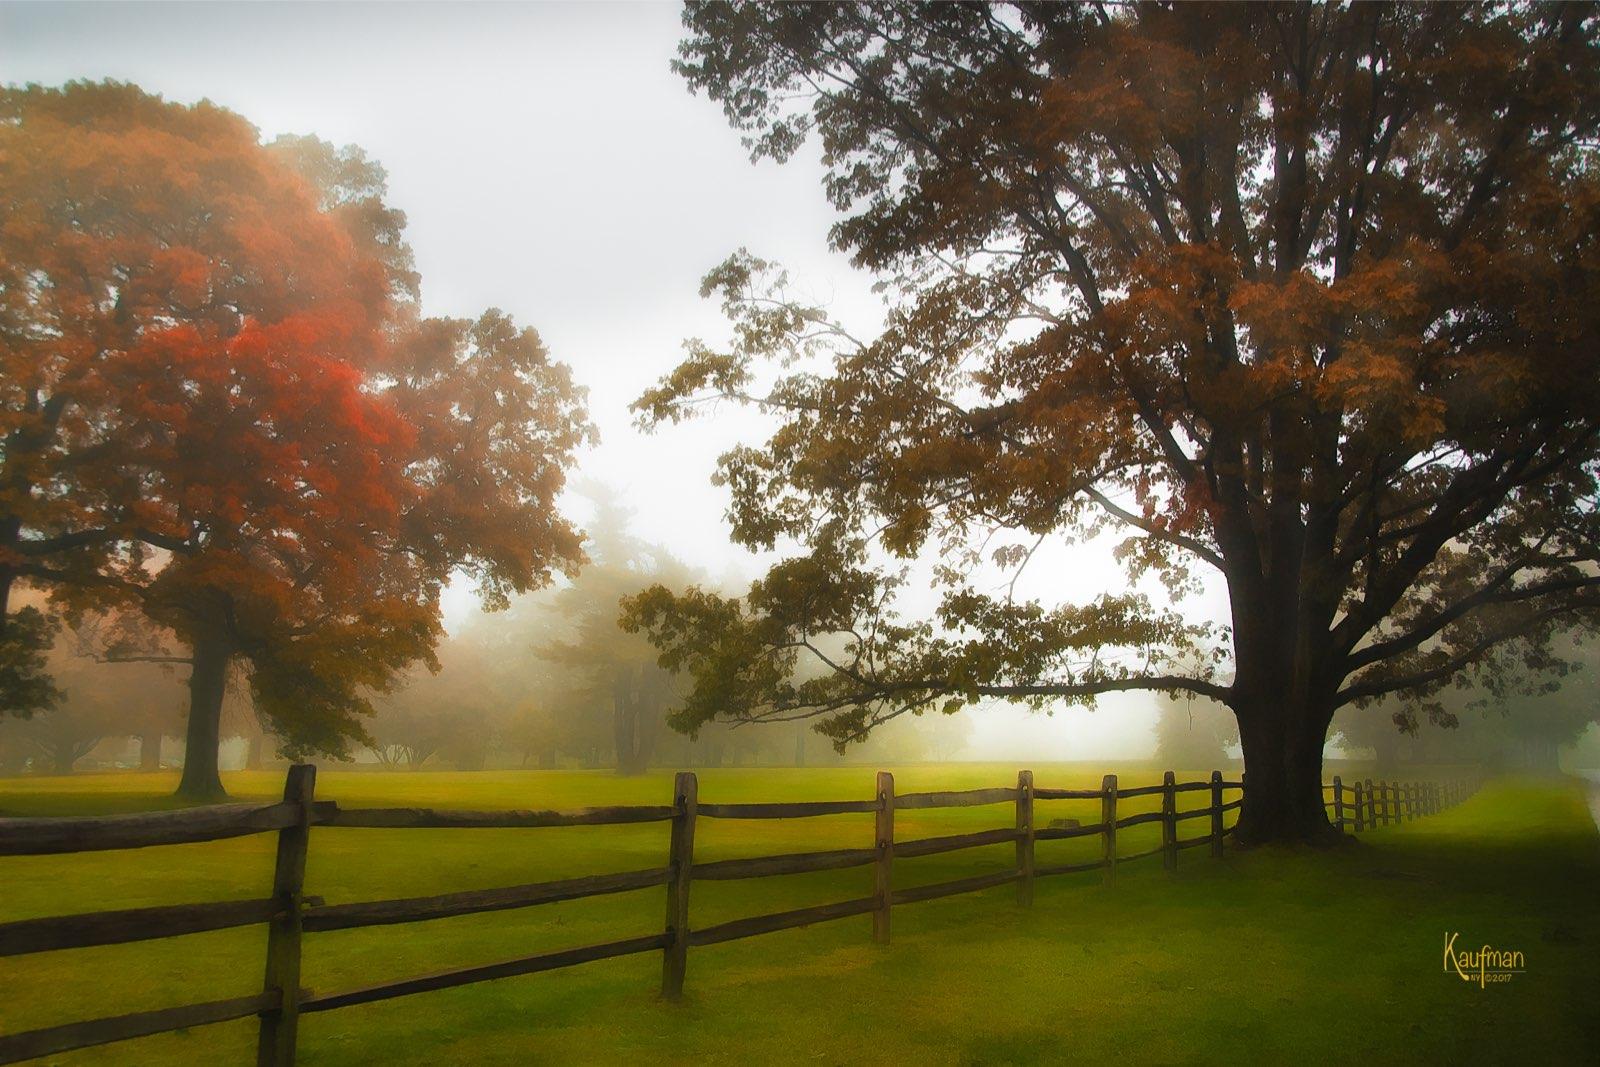 Fence & Meadows